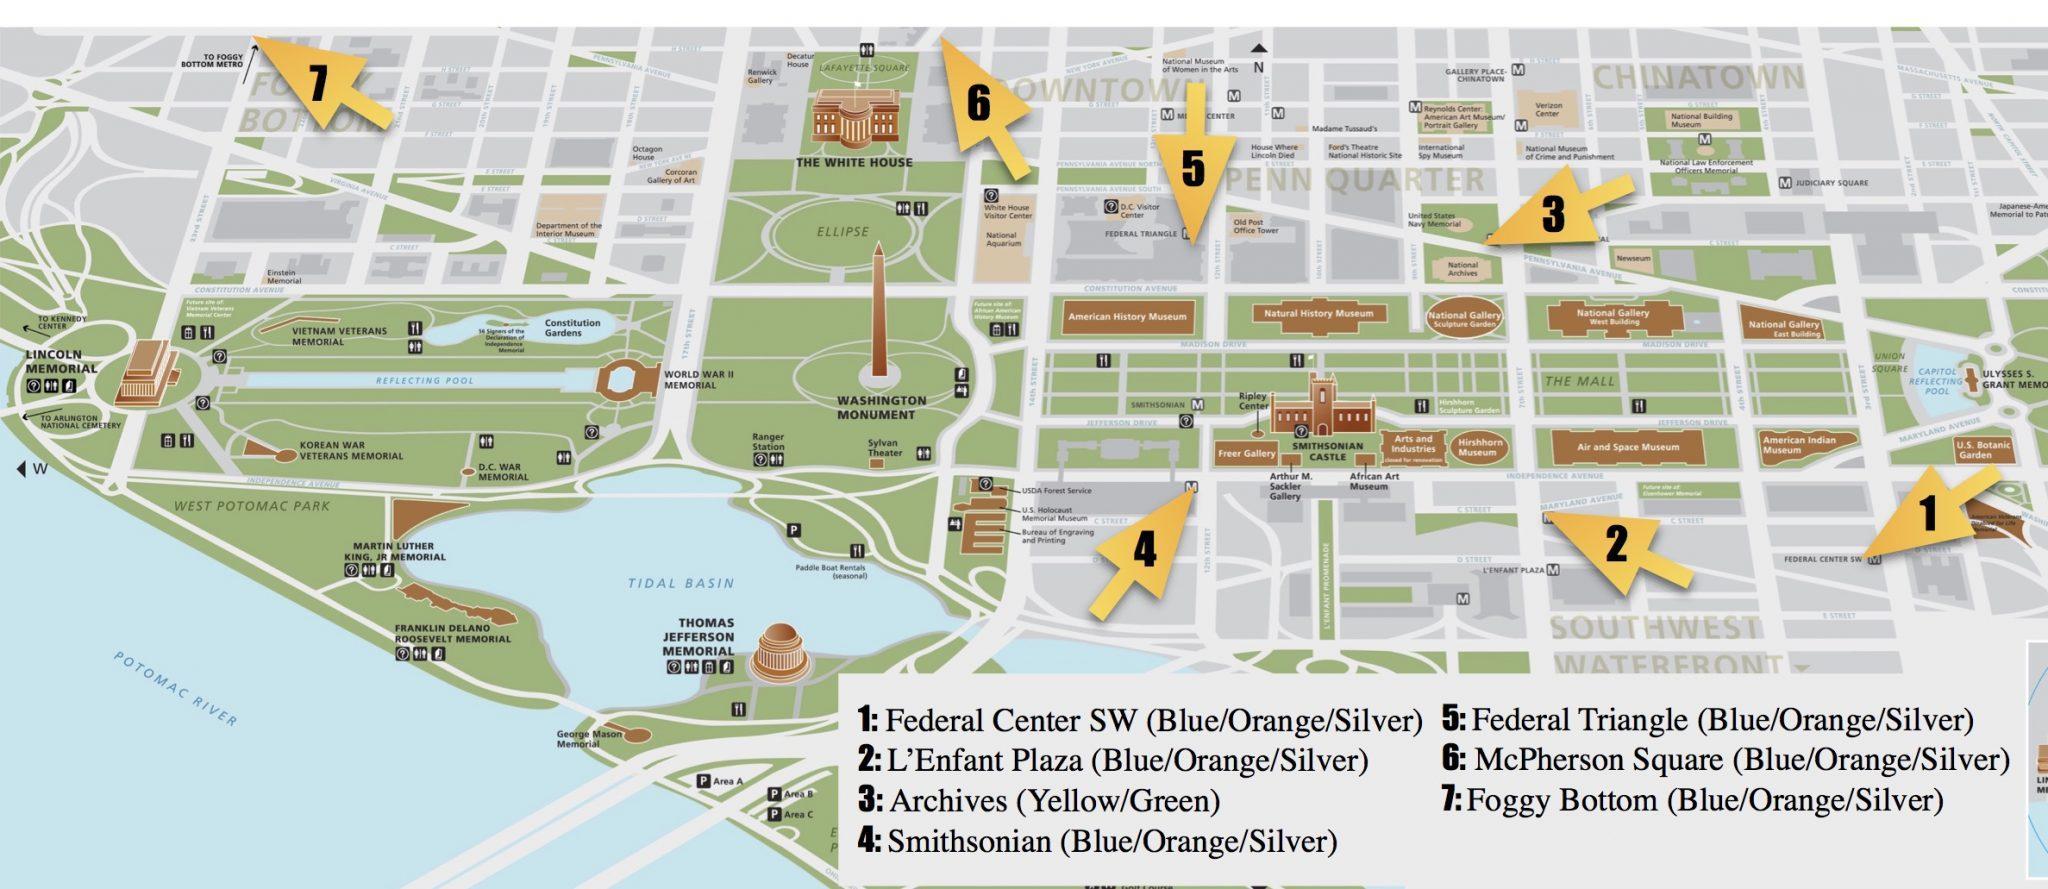 picture about Printable Map of Washington Dc identified as Washington dc shopping mall peta - Washington dc negara shopping mall peta